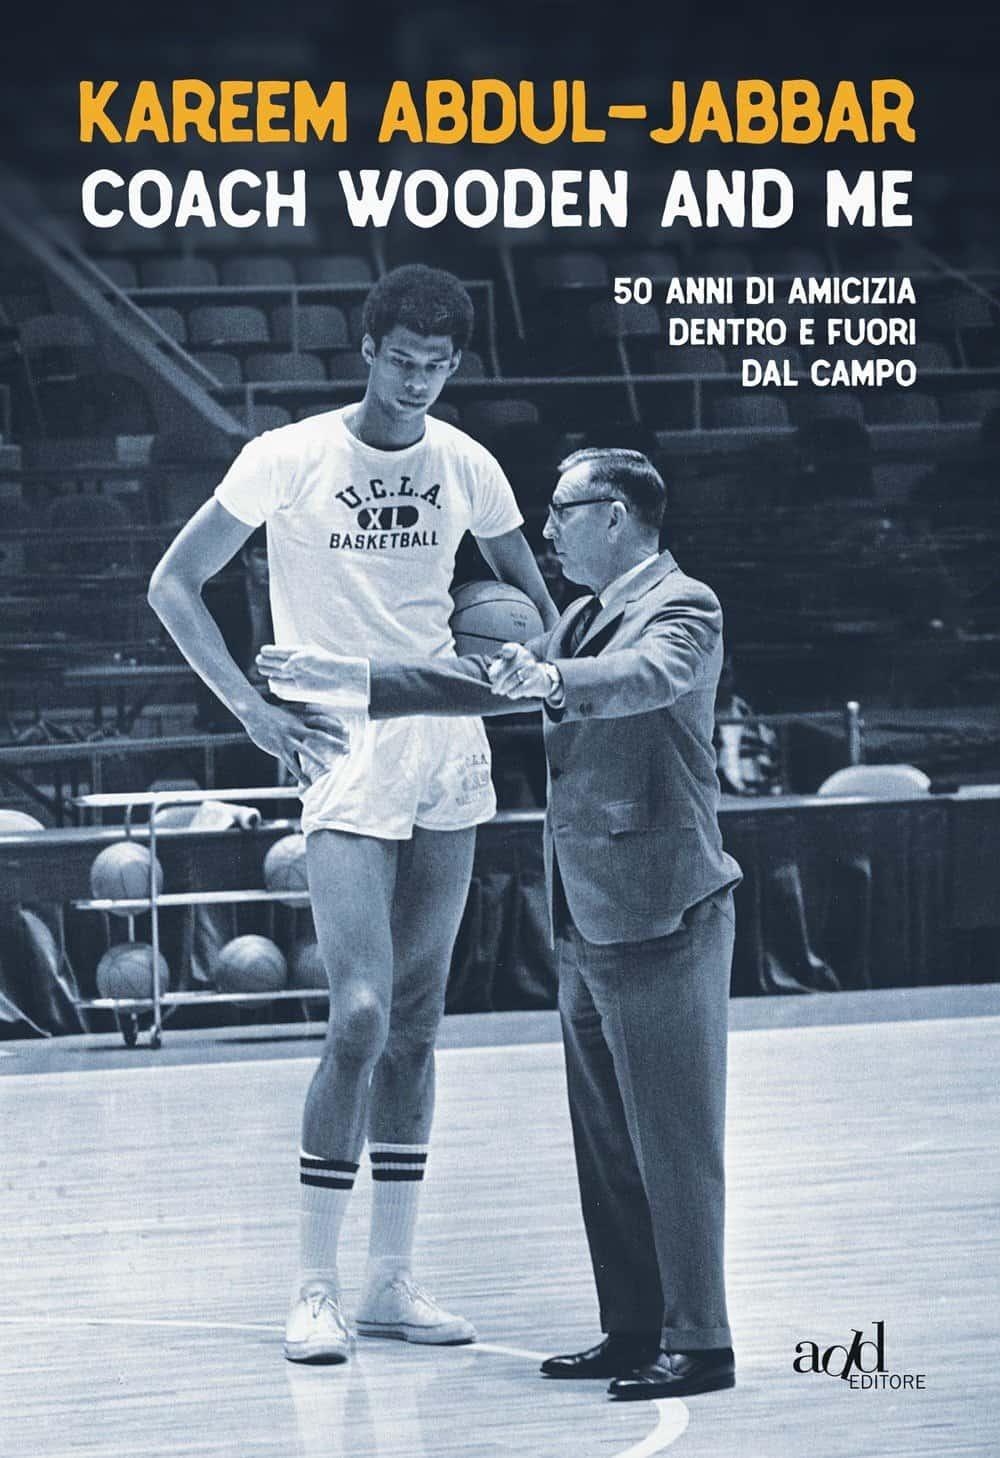 John Wooden and me (il libro)